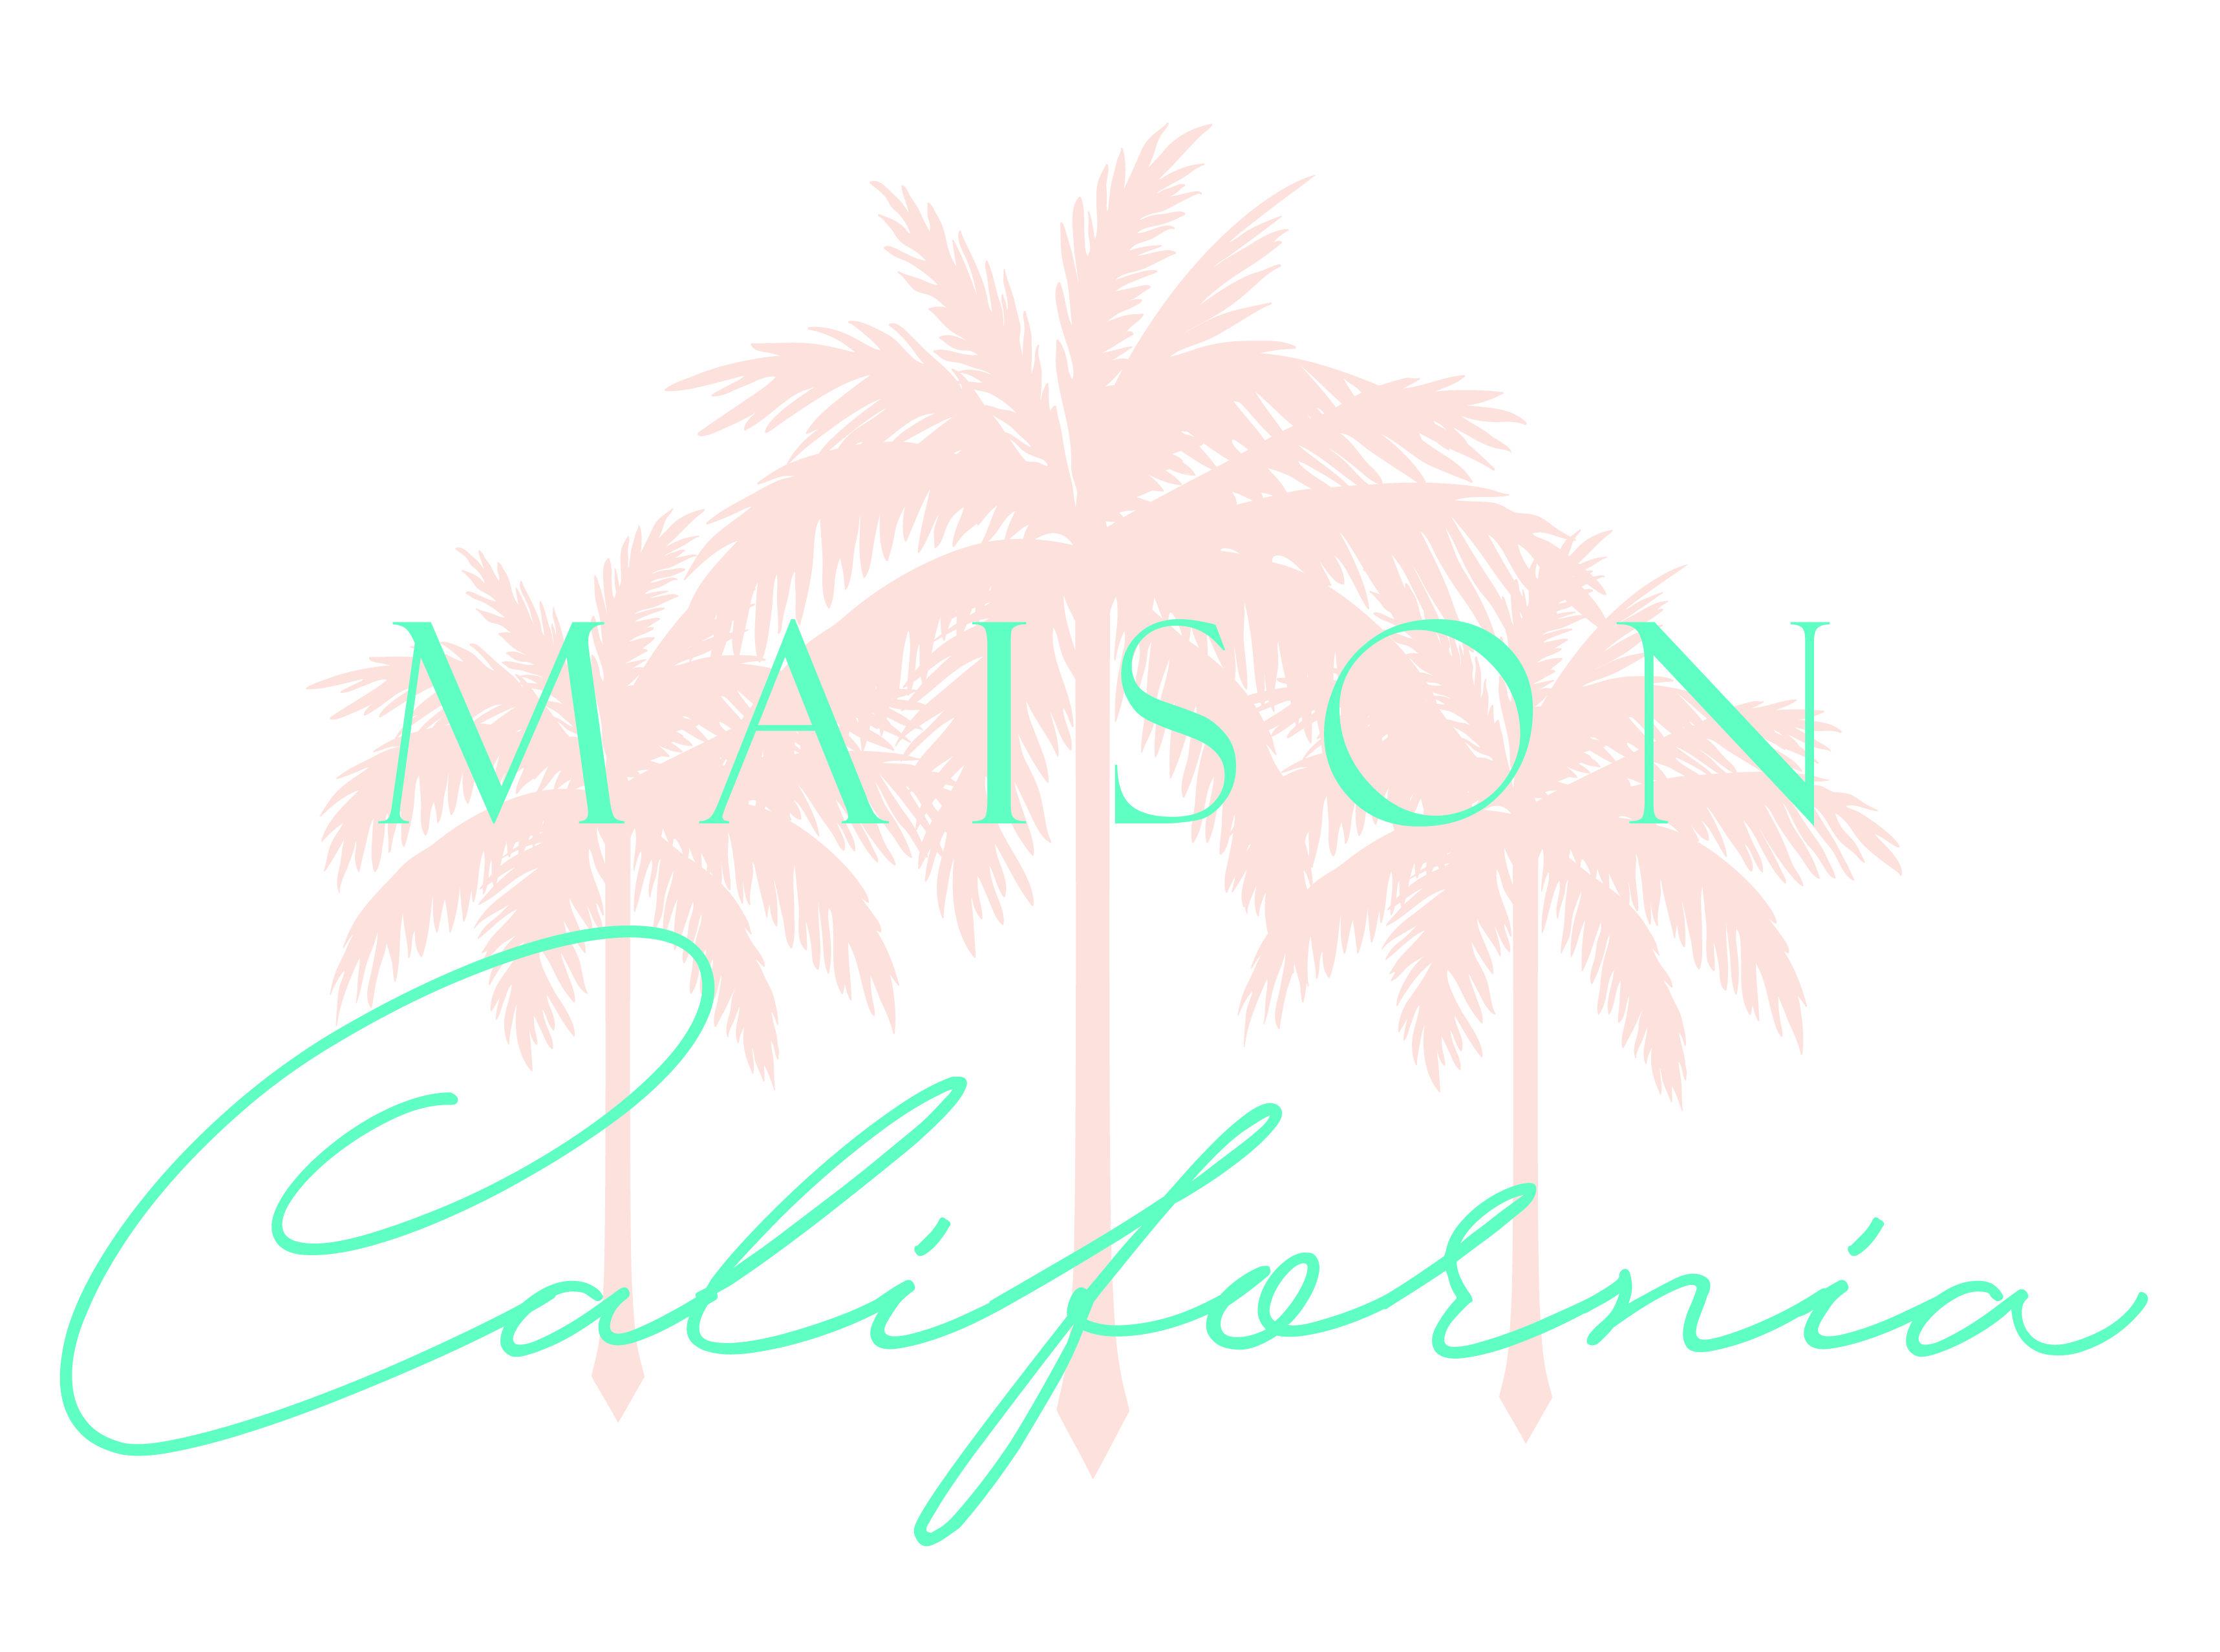 Maison California